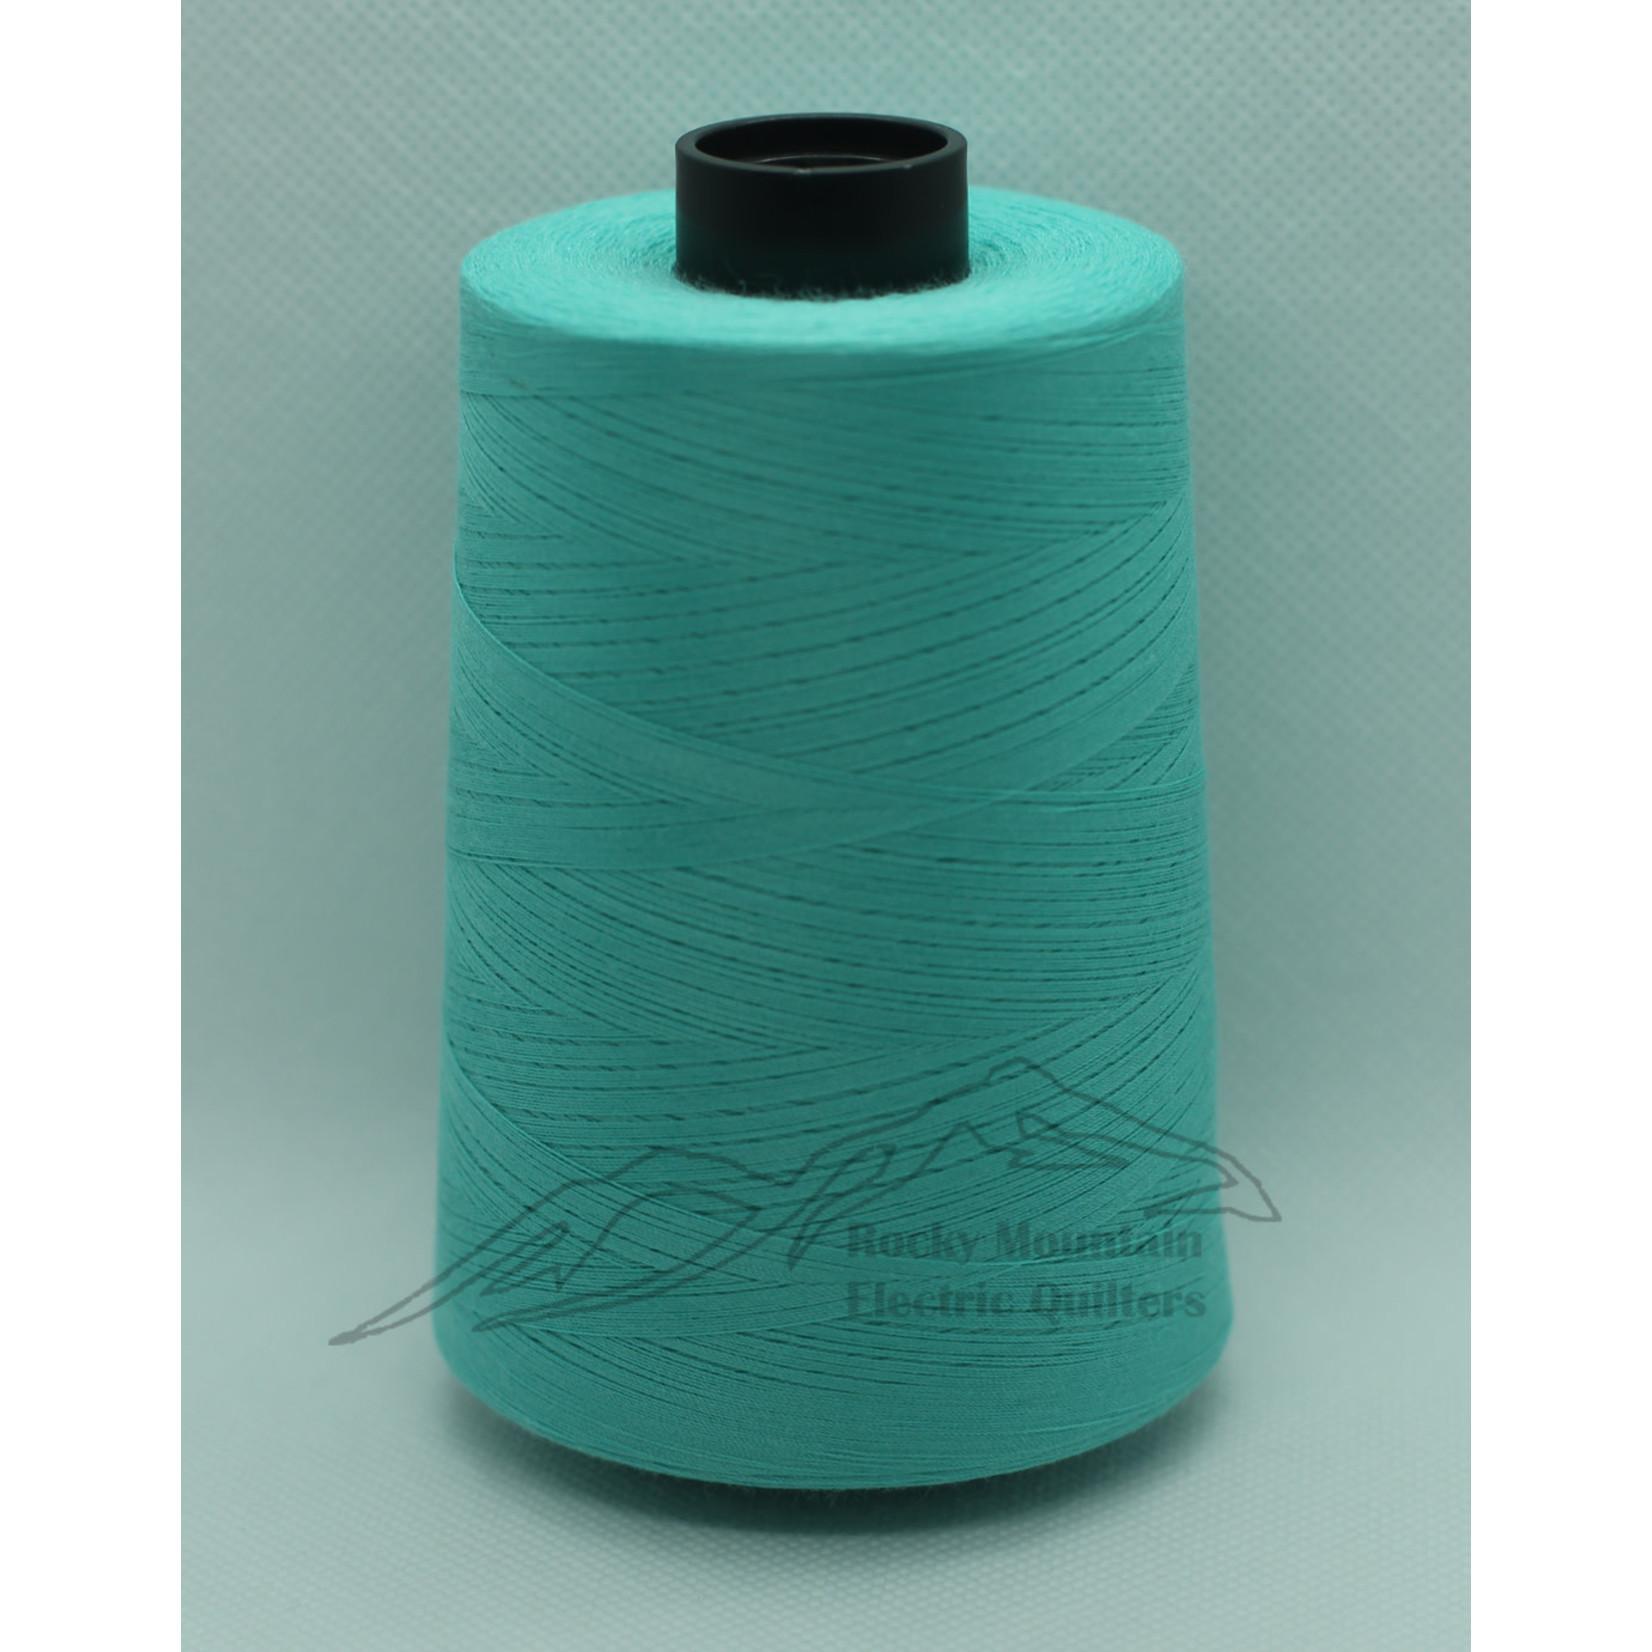 A & E 32981 Bright Turquoise, Permacore Tex 30